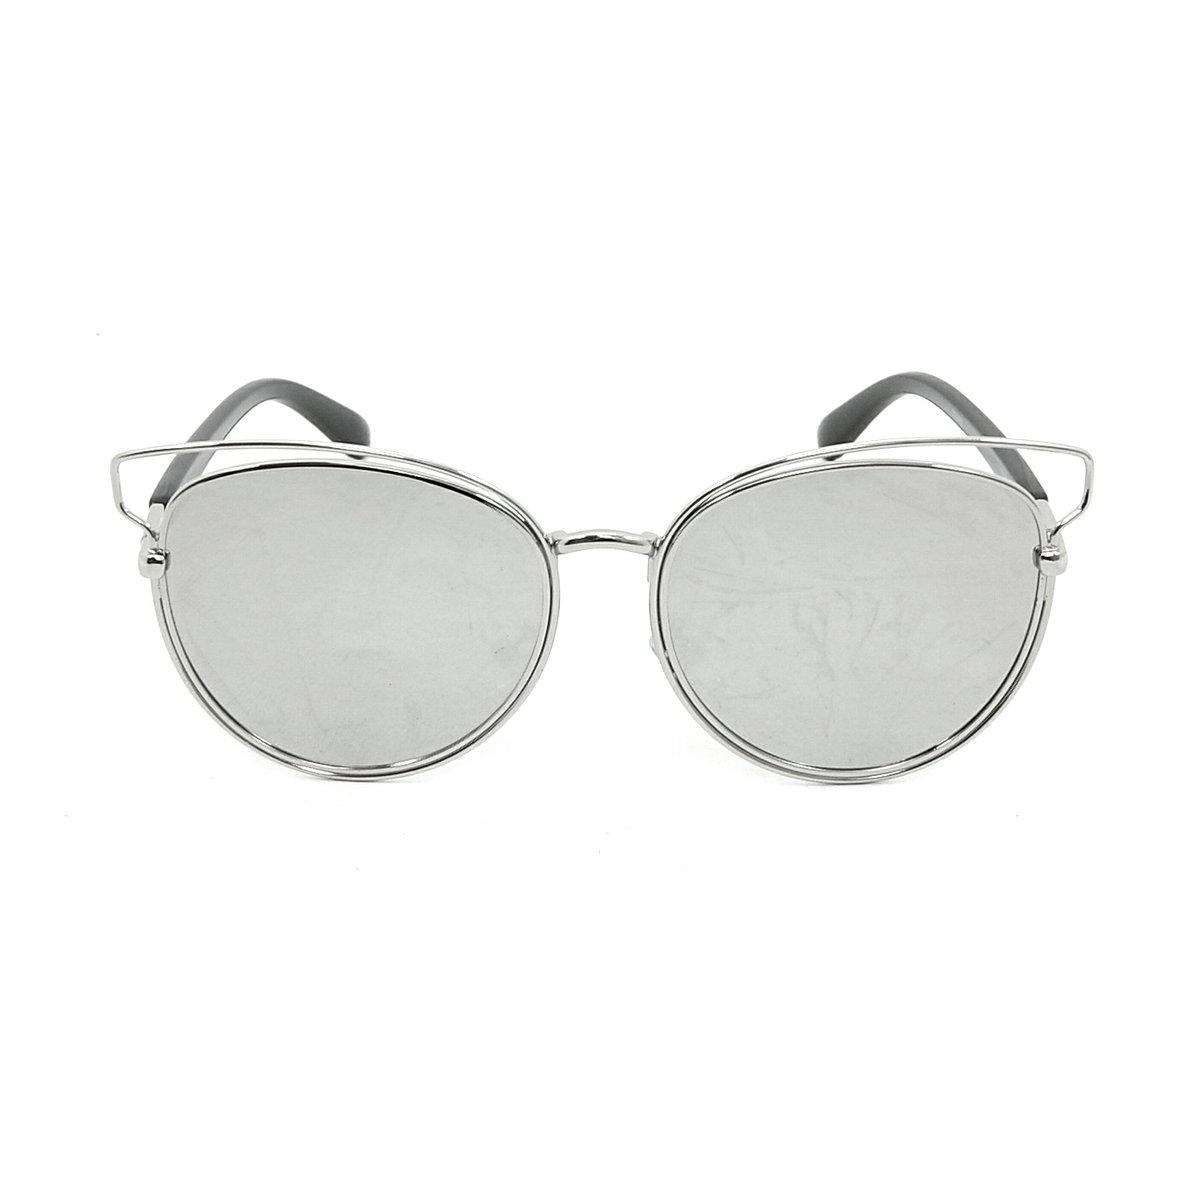 Óculos Bijoulux de Sol Estilo Dior Gatinha Espelhado - Compre Agora ... 0b957ece1a